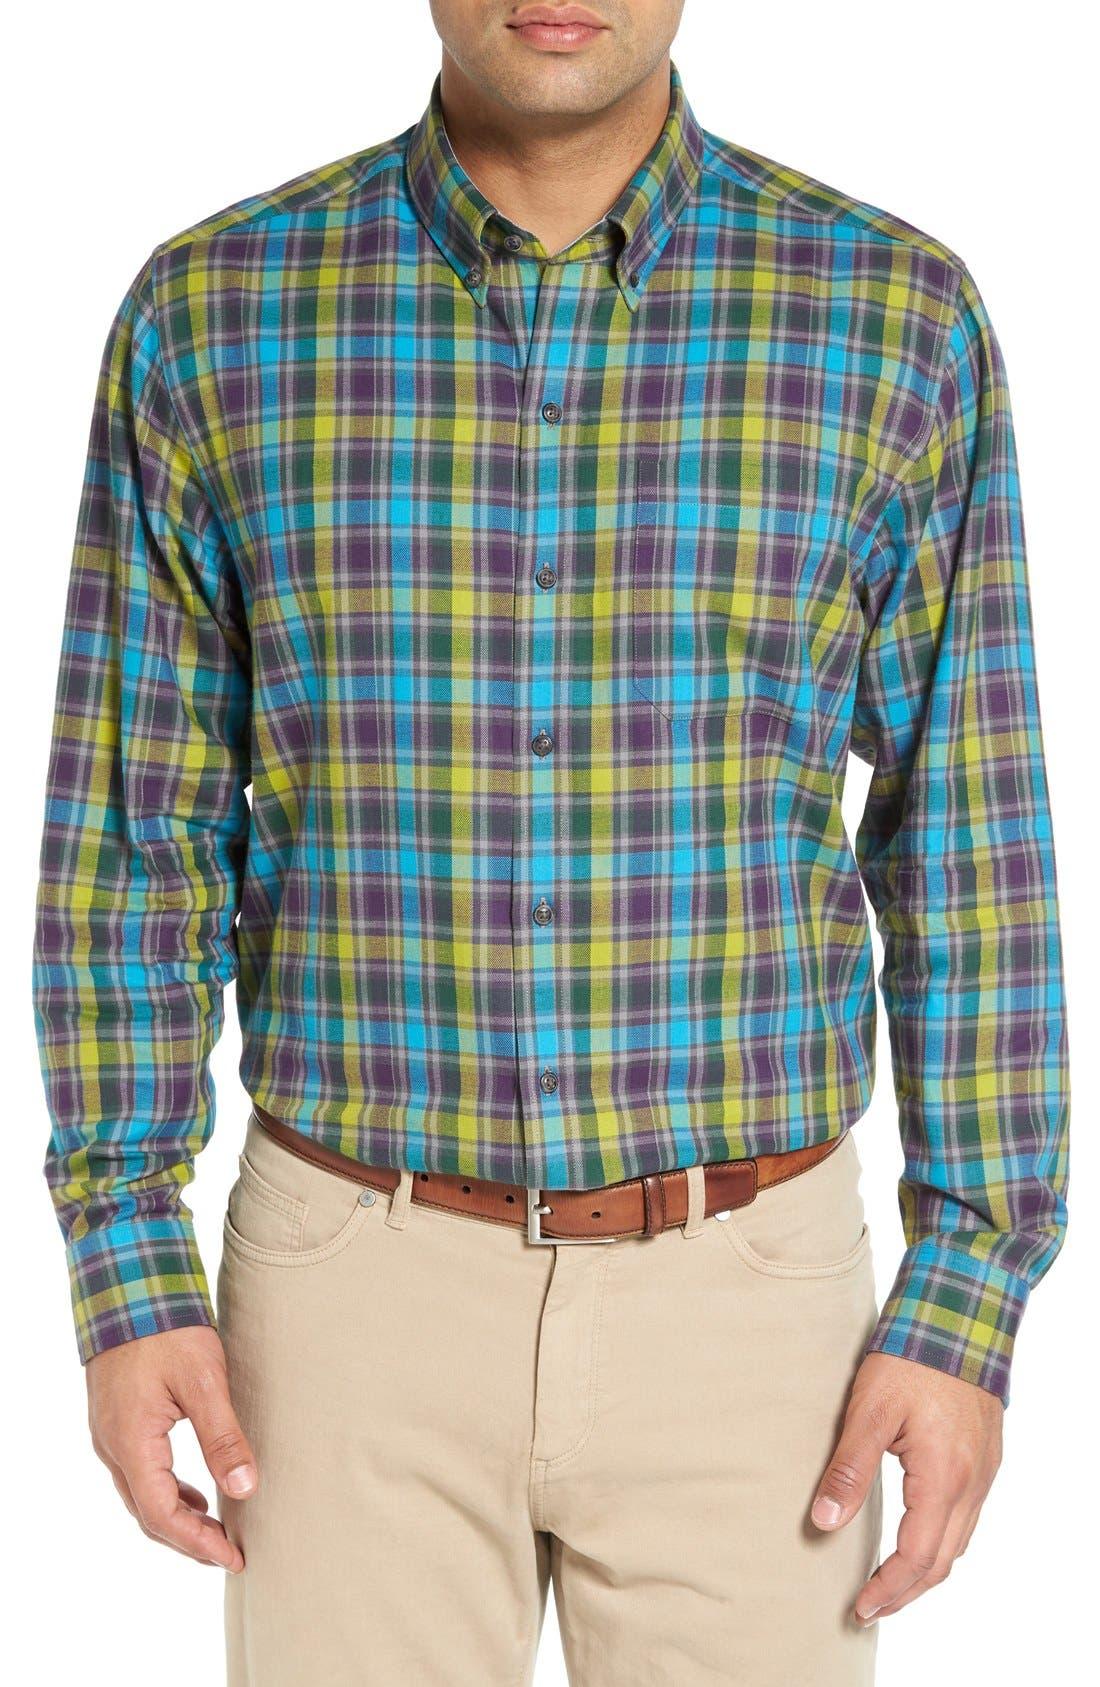 Cutter & Buck 'Timber' Plaid Cotton Twill Sport Shirt (Big & Tall)